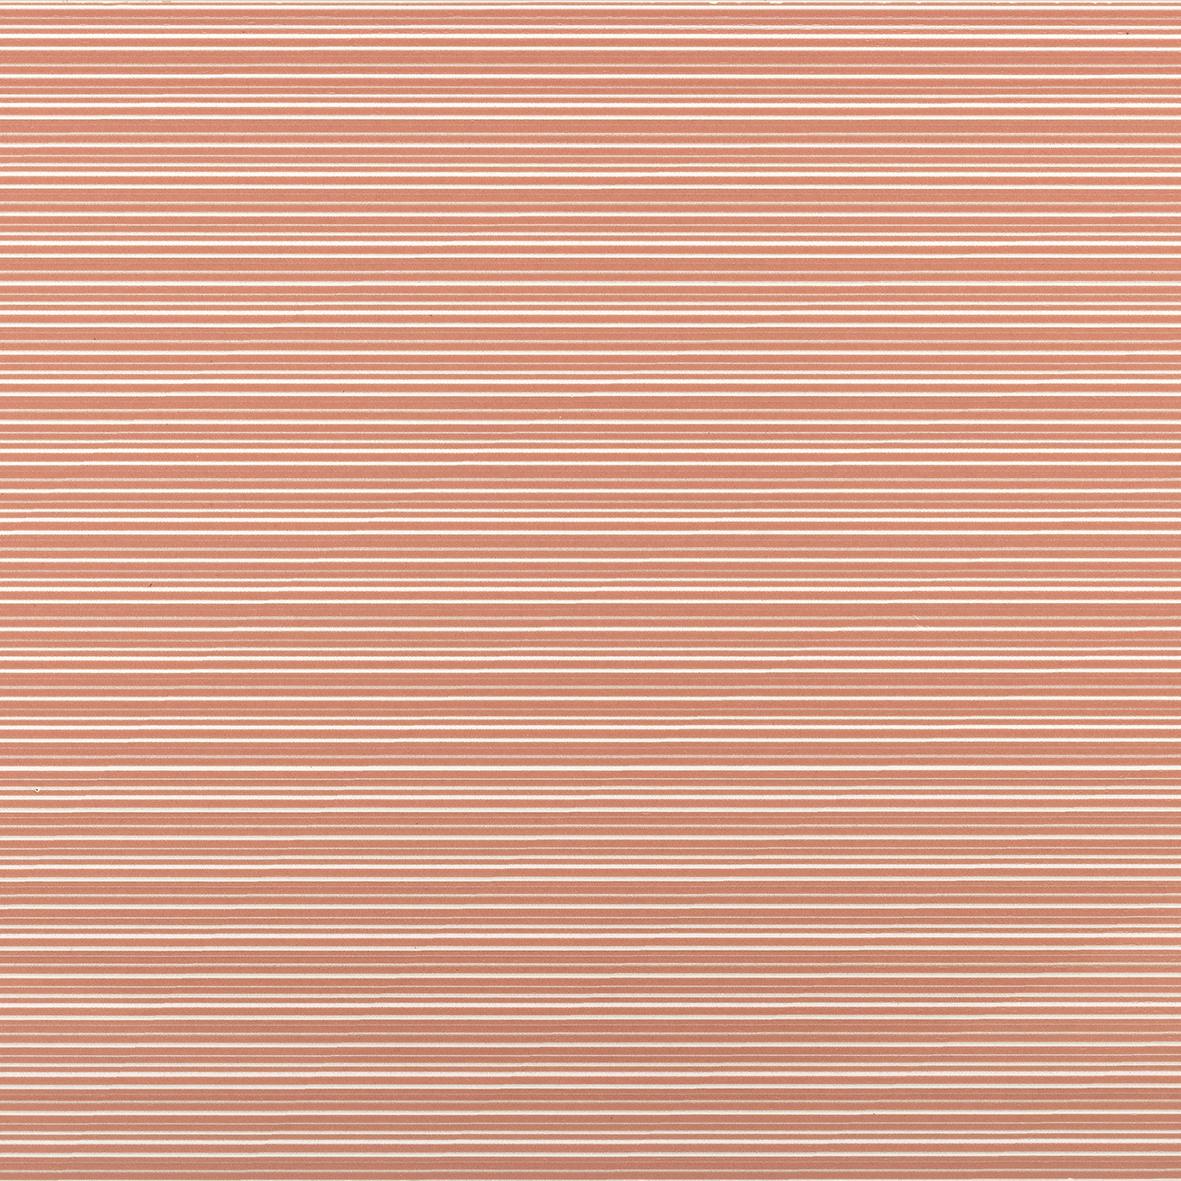 HFM Anti-Skid EC Stripes Pink Dk